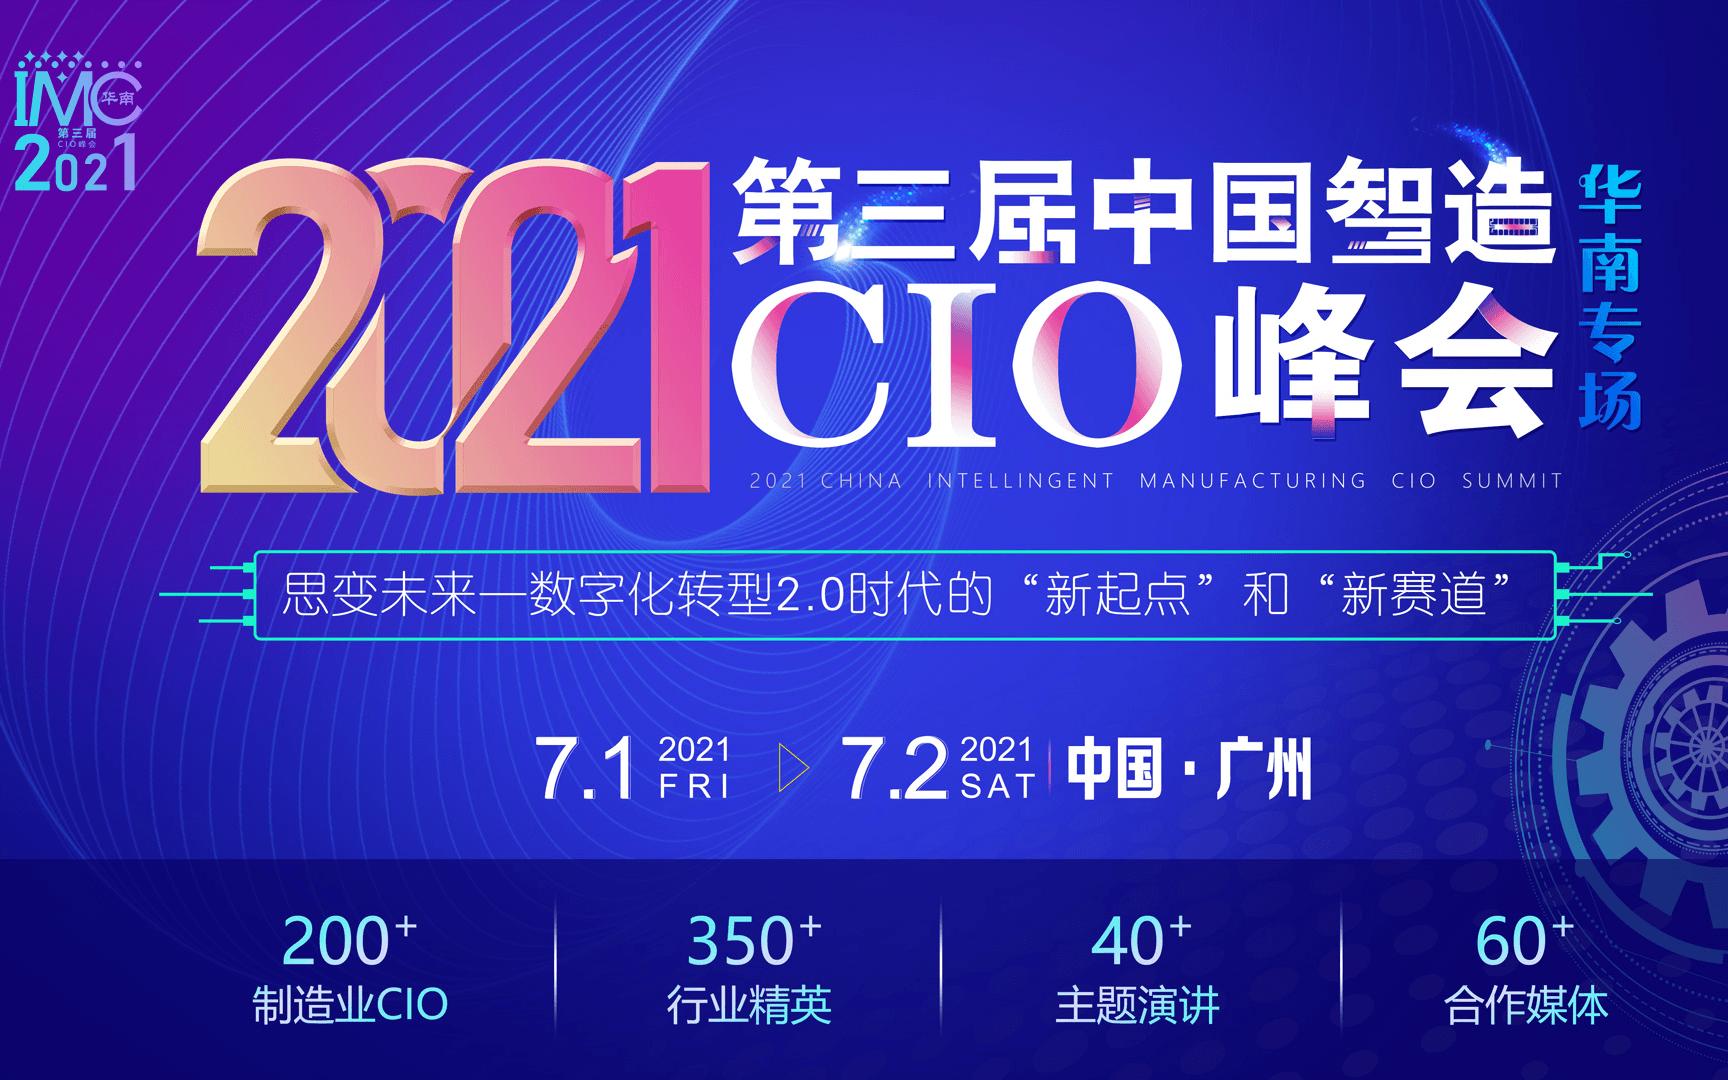 IMC 2021第三届中国智造CIO峰会(华南)